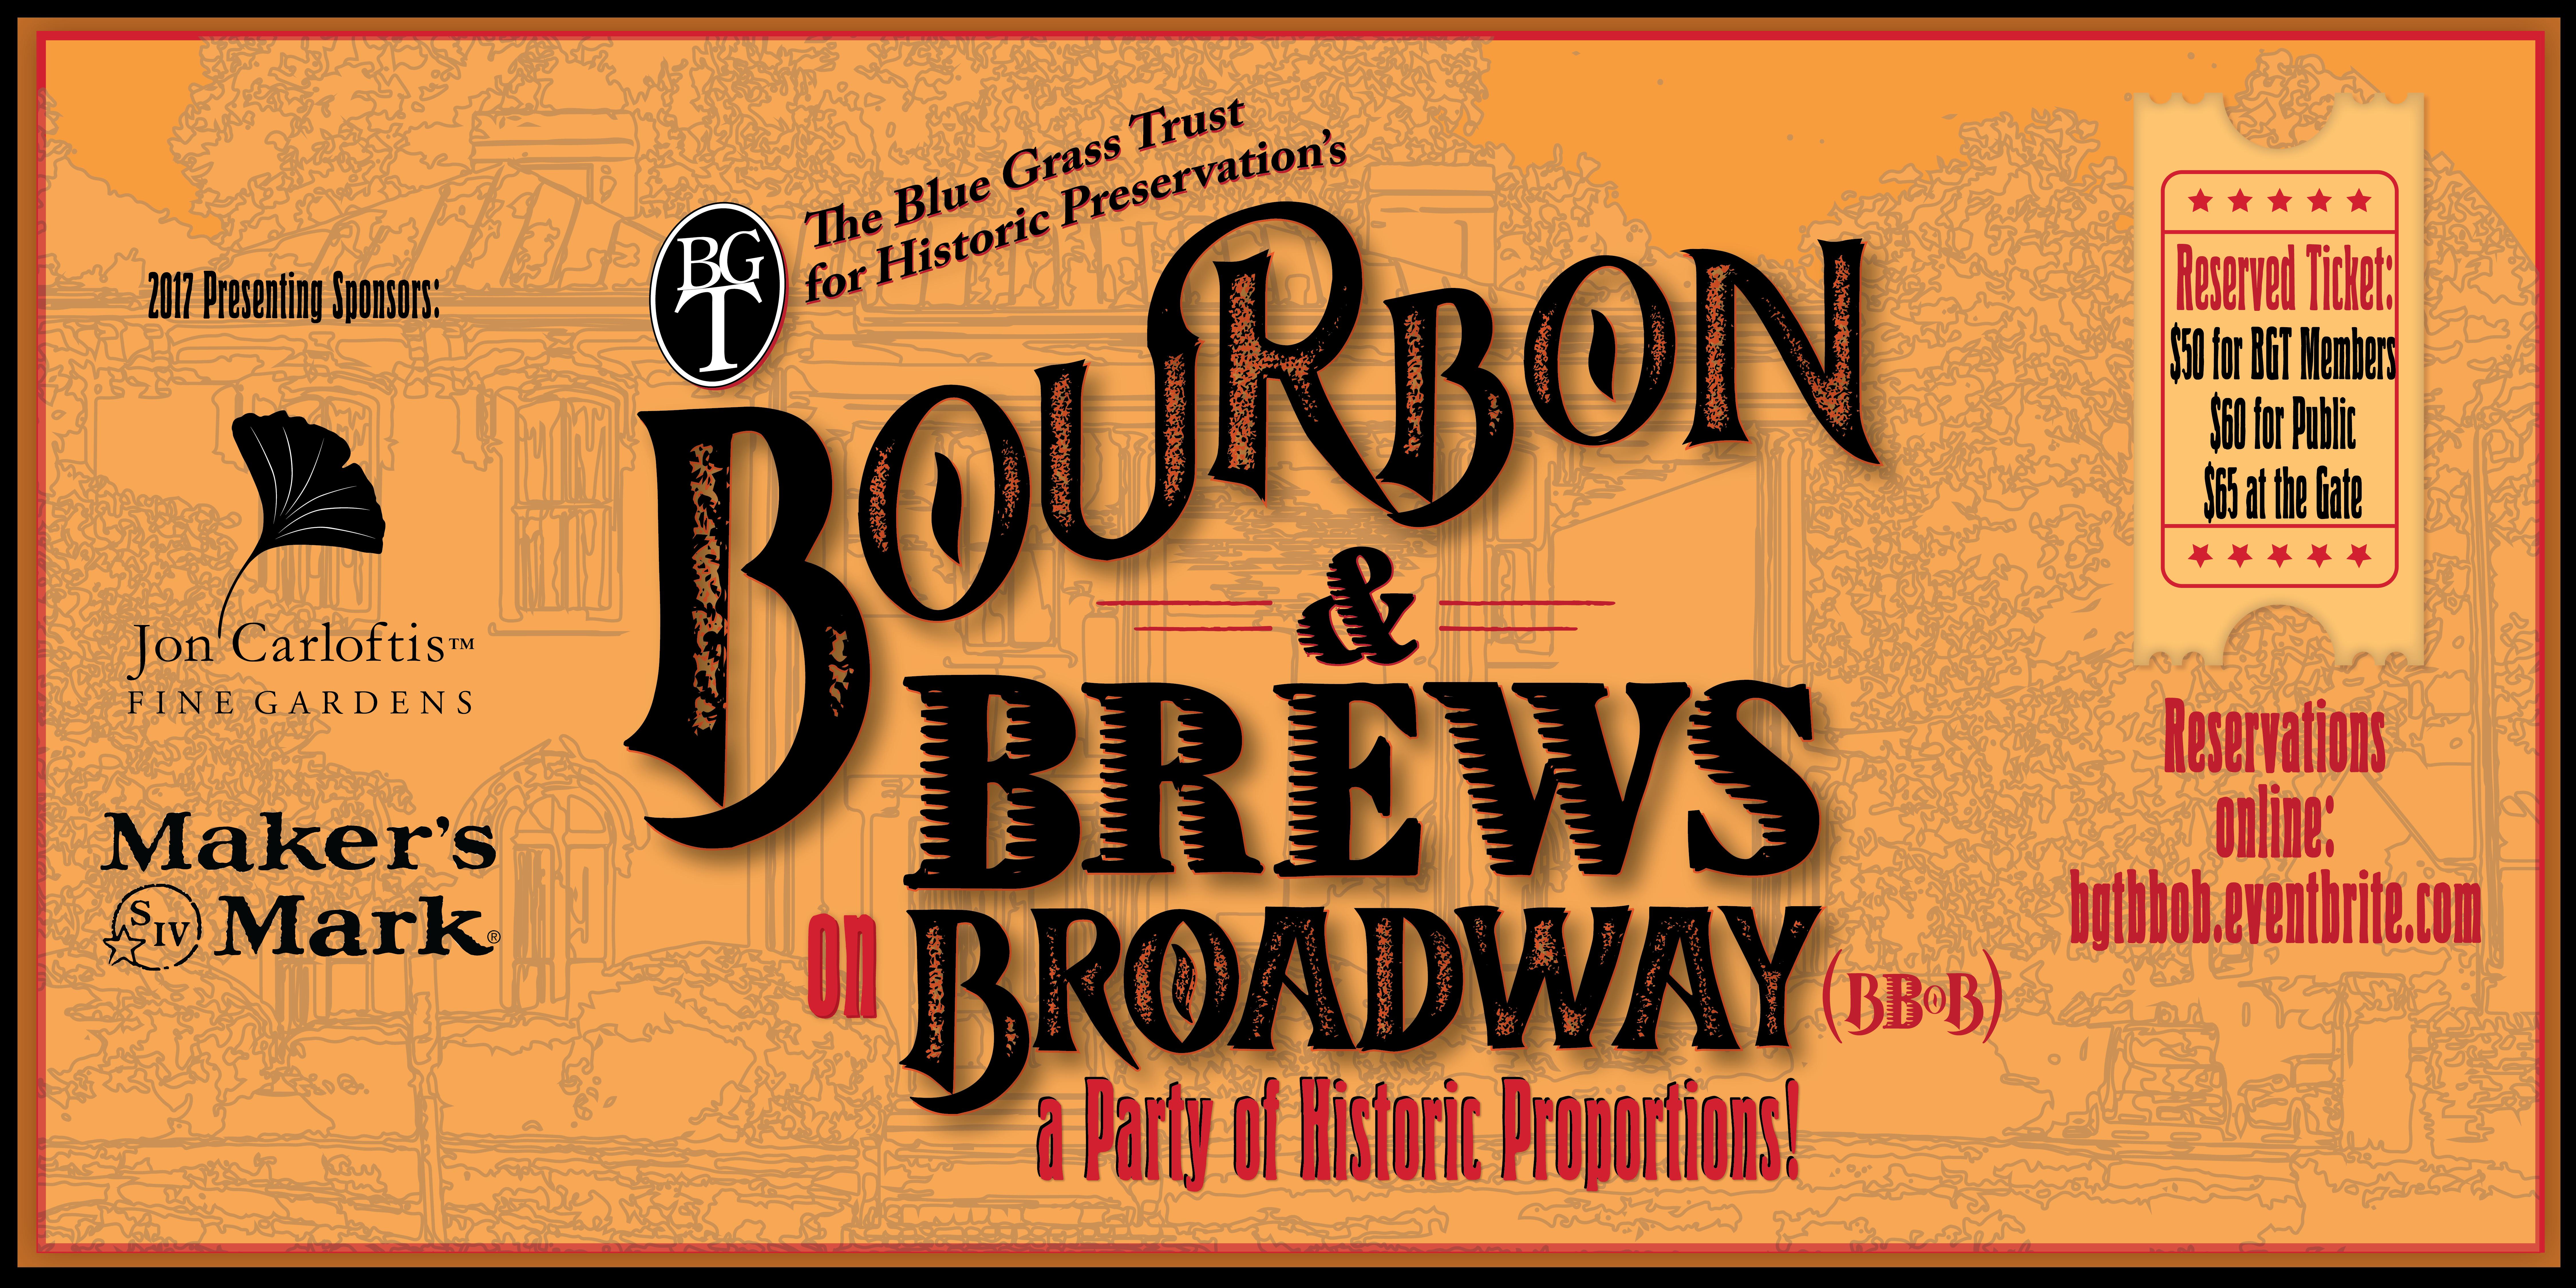 BGT's Bourbon & Brews on Broadway: A Party of